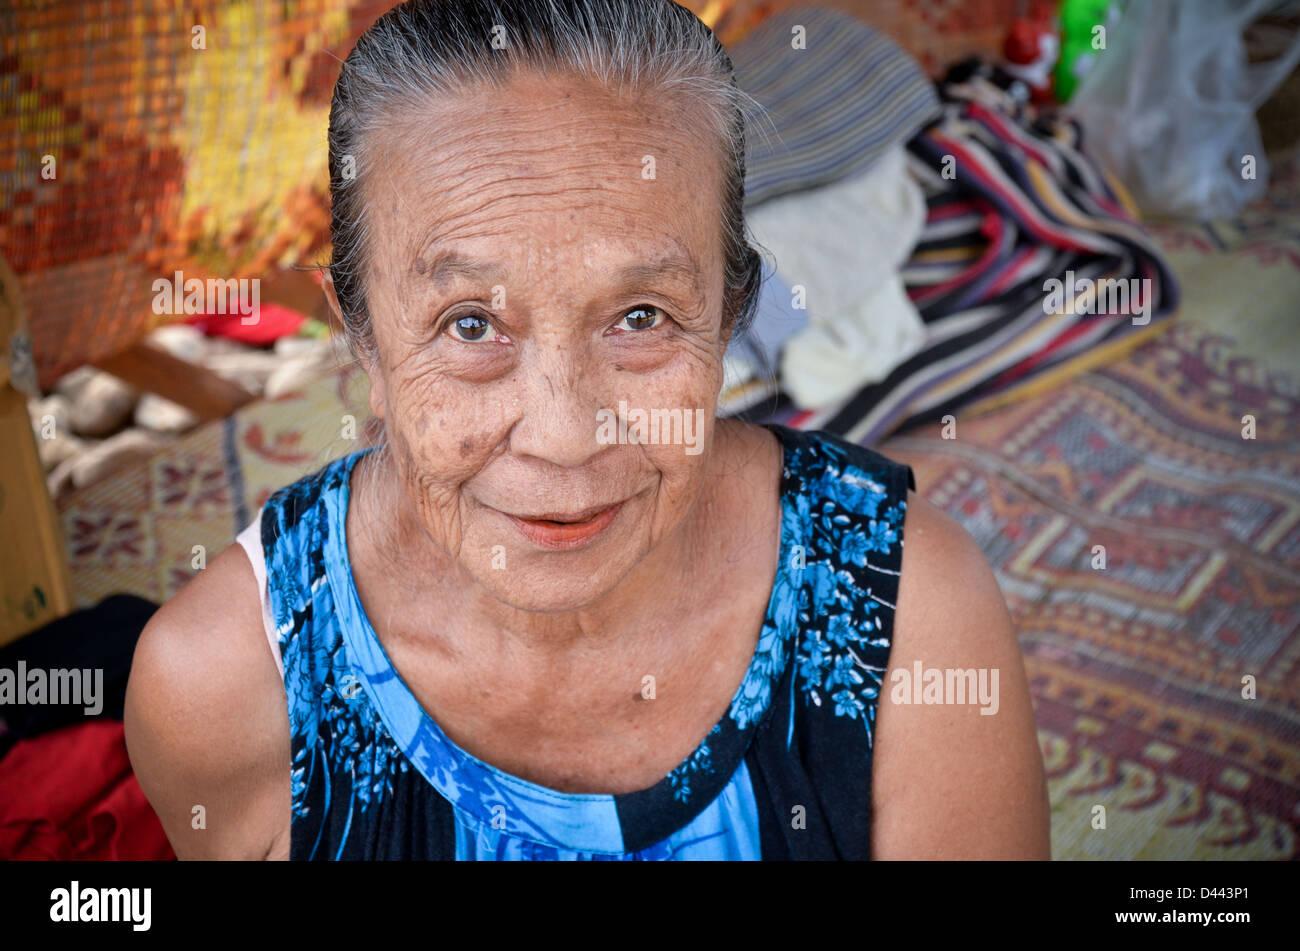 Laotian woman at a market, Luang Prabang, Laos - Stock Image